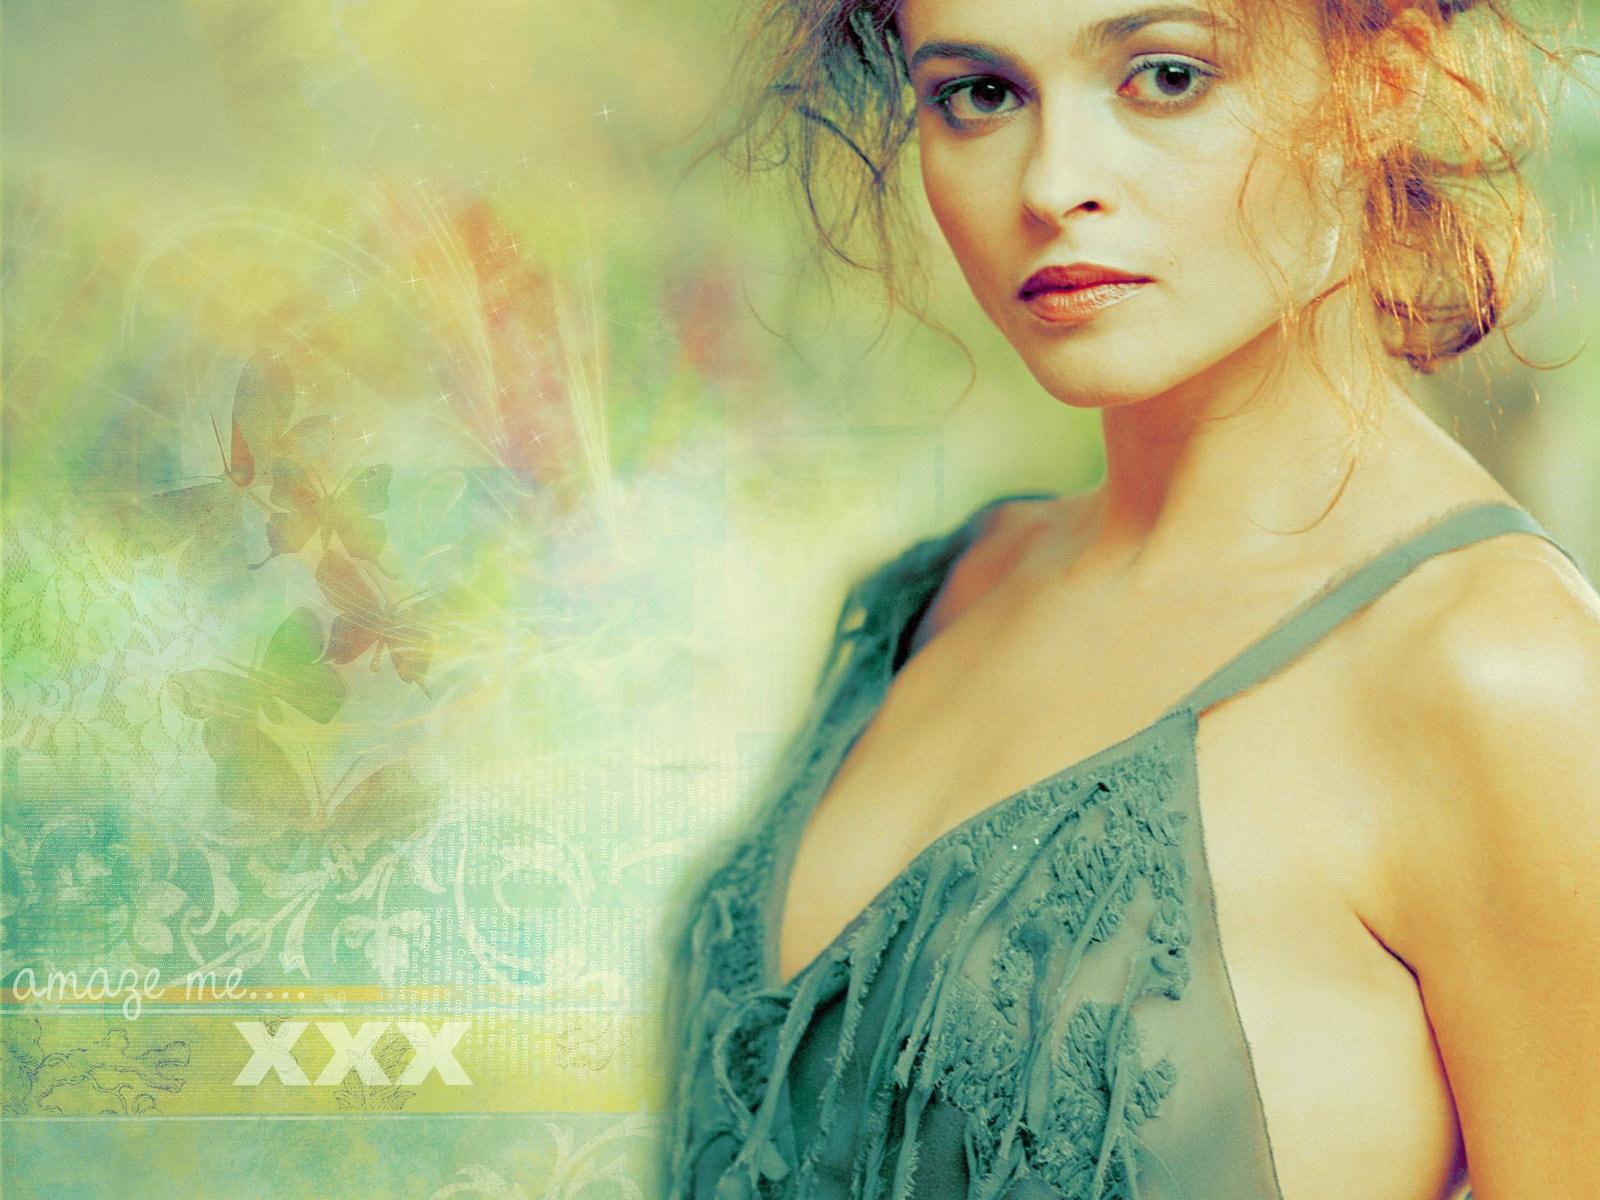 Helena Bonham Carter Widescreen for desktop